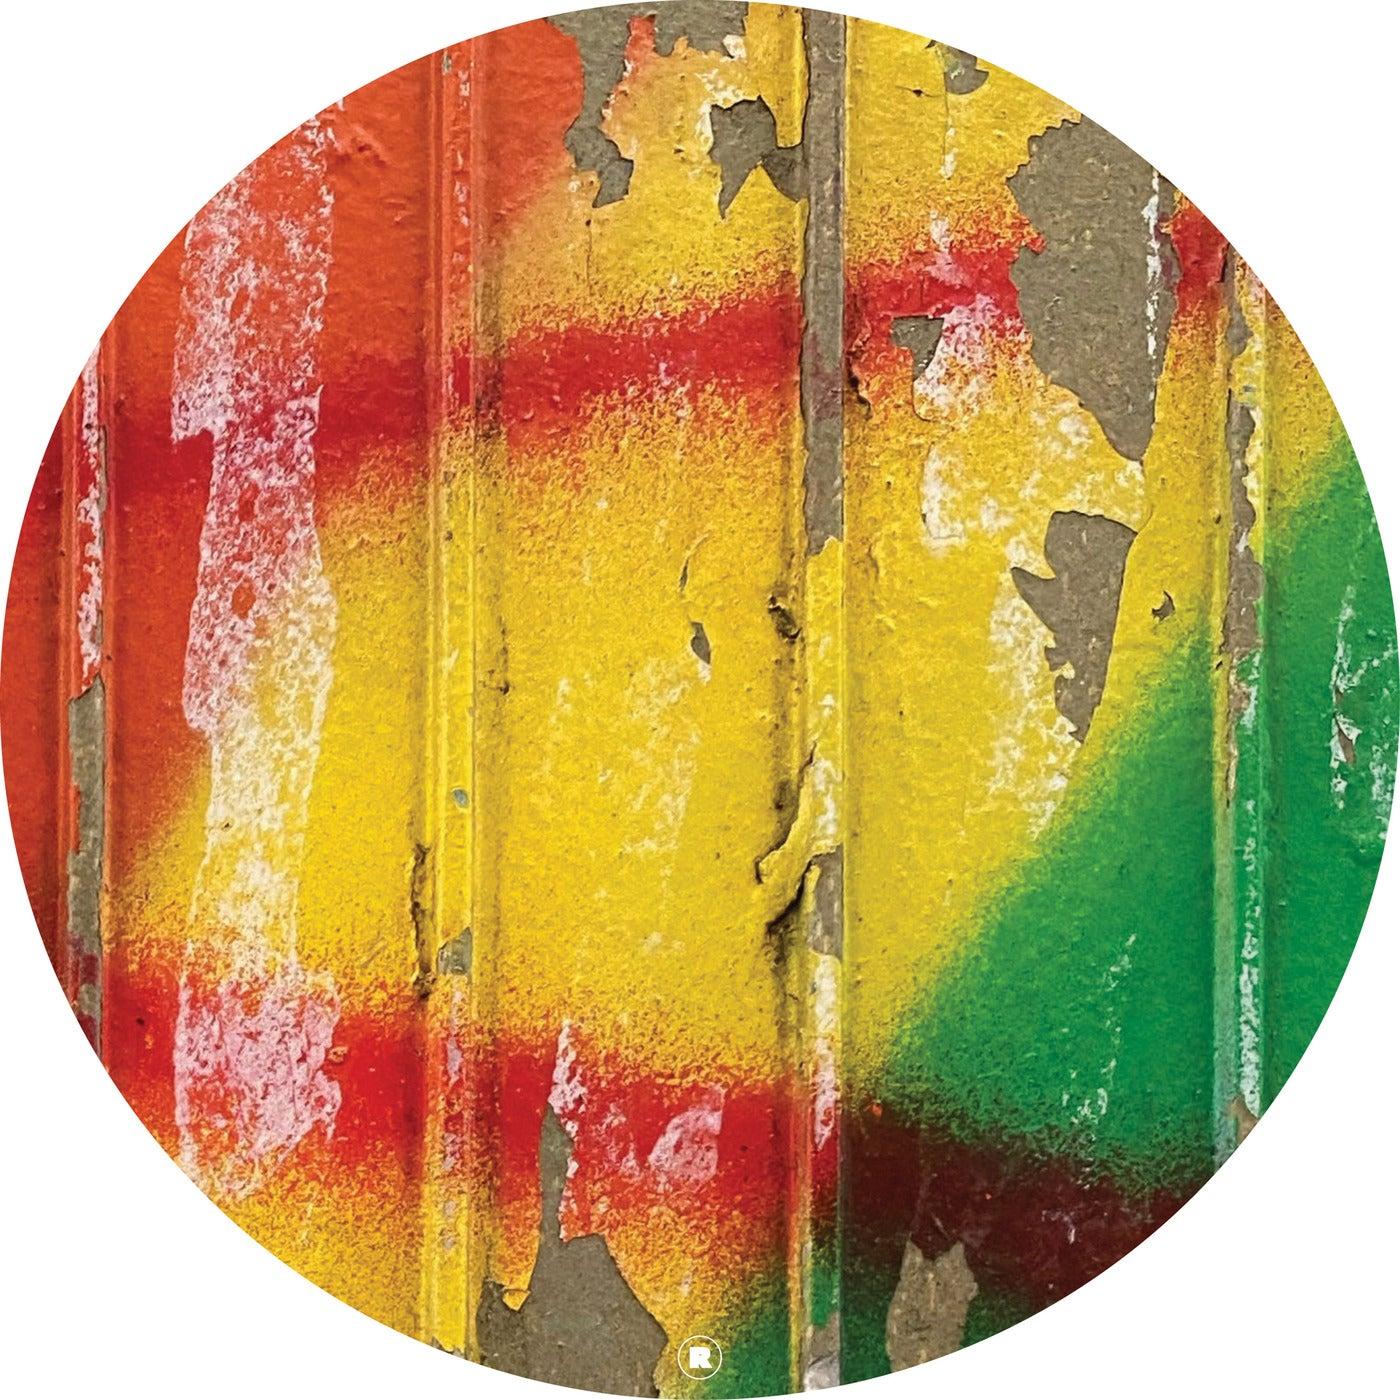 No Drama (Chris Liebing Remix)